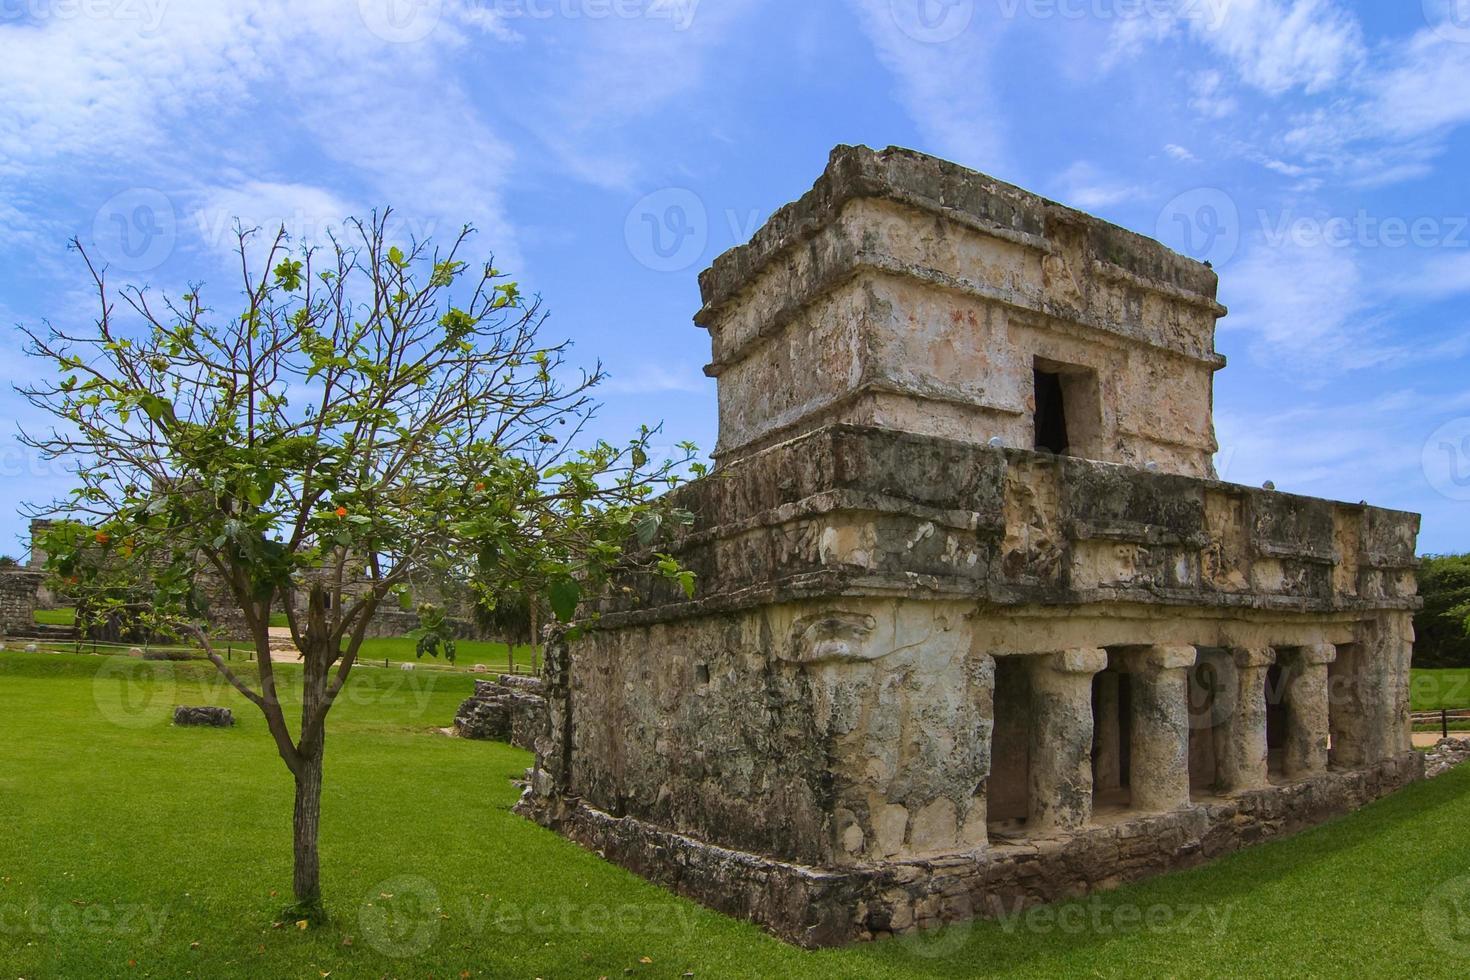 Tulum templo de las pinturas o frescos foto